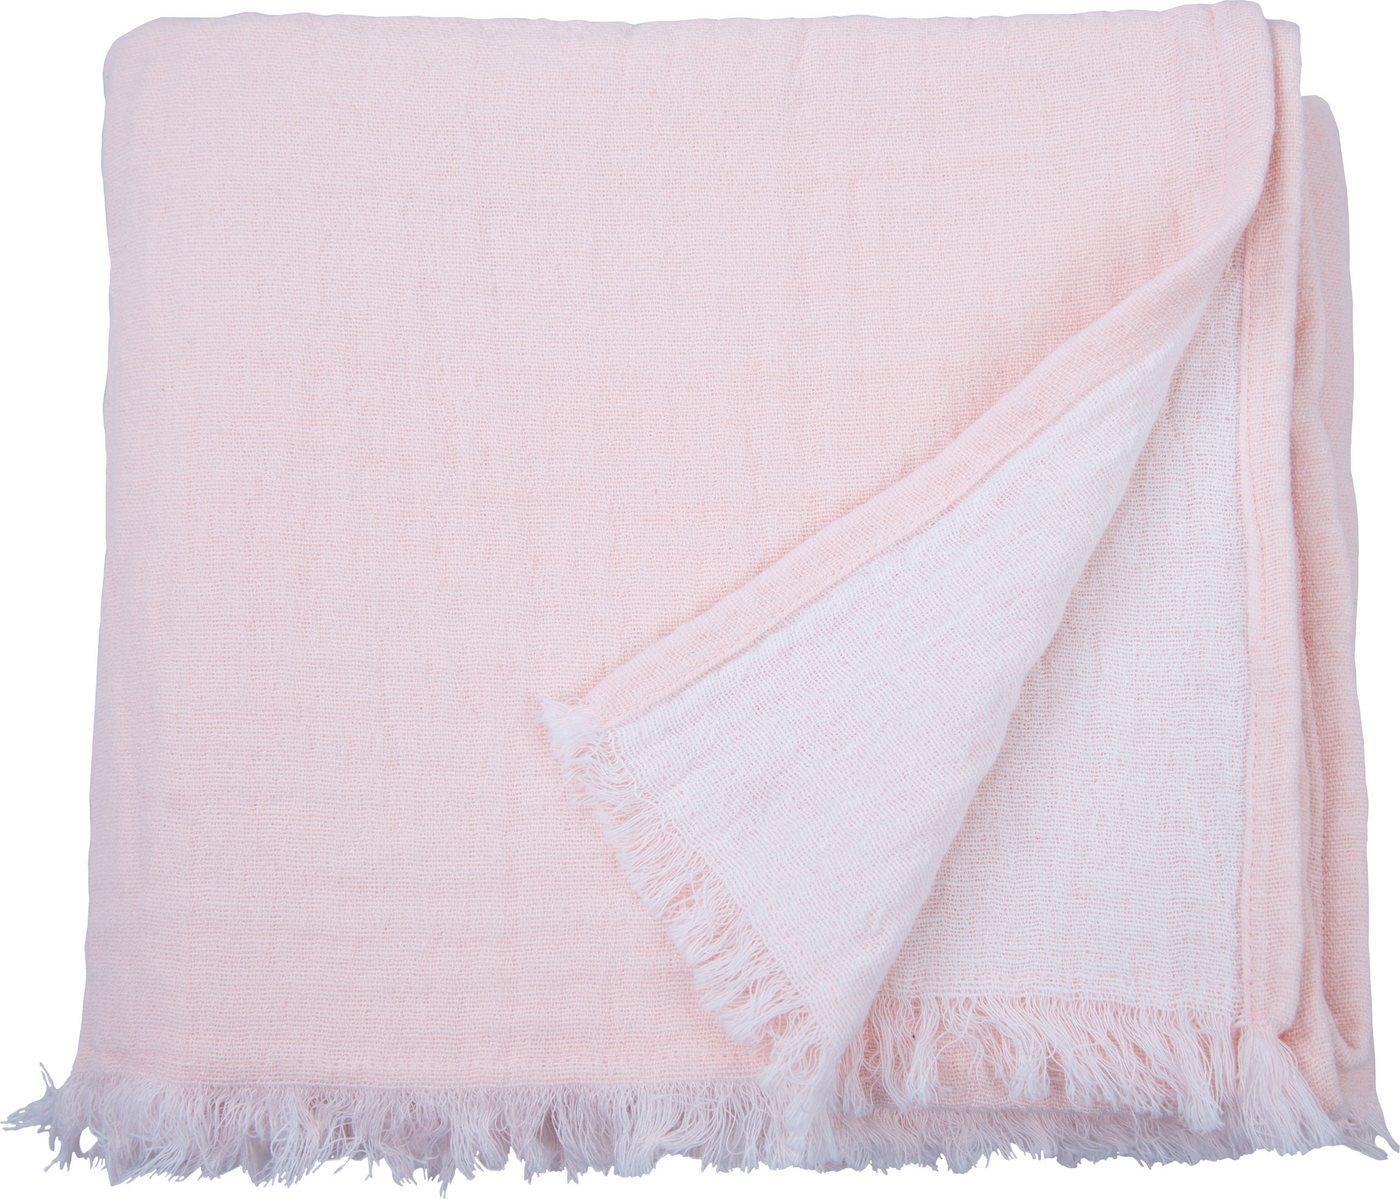 Plaid »Fringed Cotton«, TOM TAILOR, mit Fransen, rosa